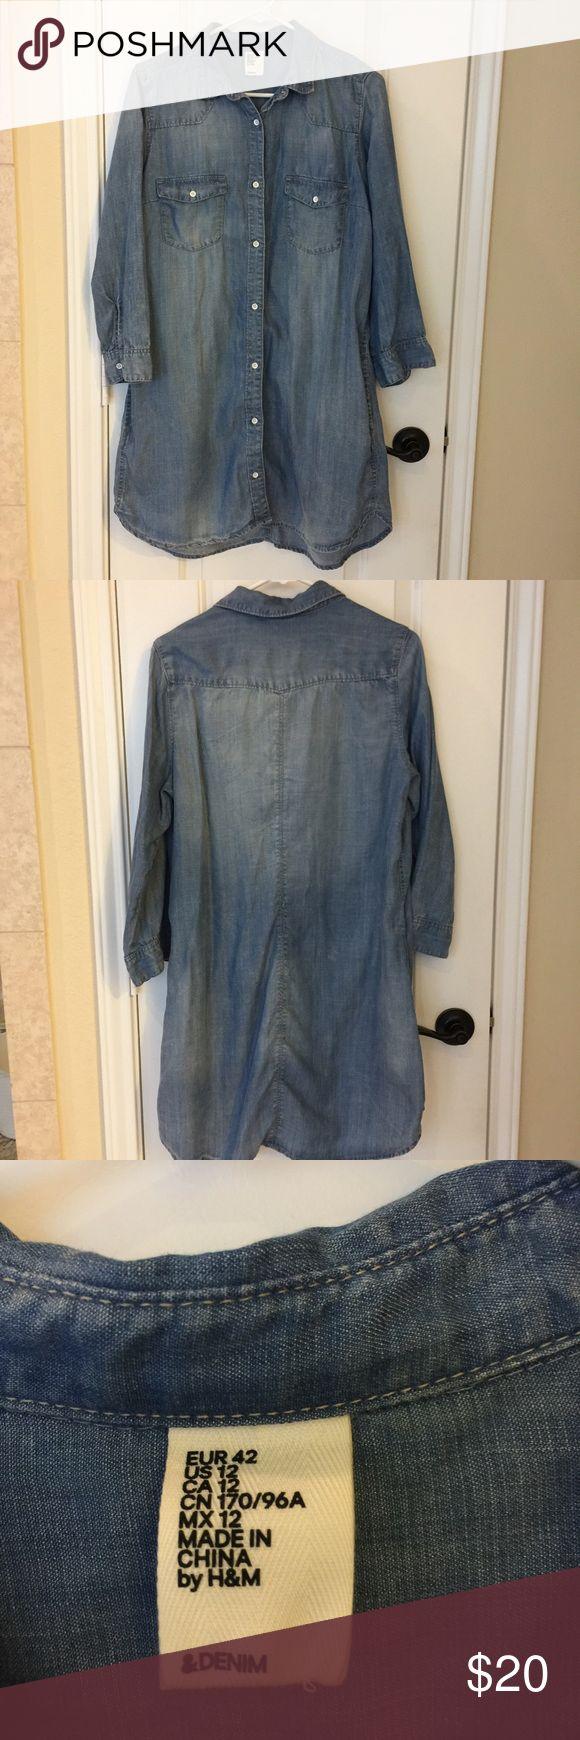 Chambray shirt dress. Chambray shirt dress. Side pockets. Very soft. H&M Dresses Midi